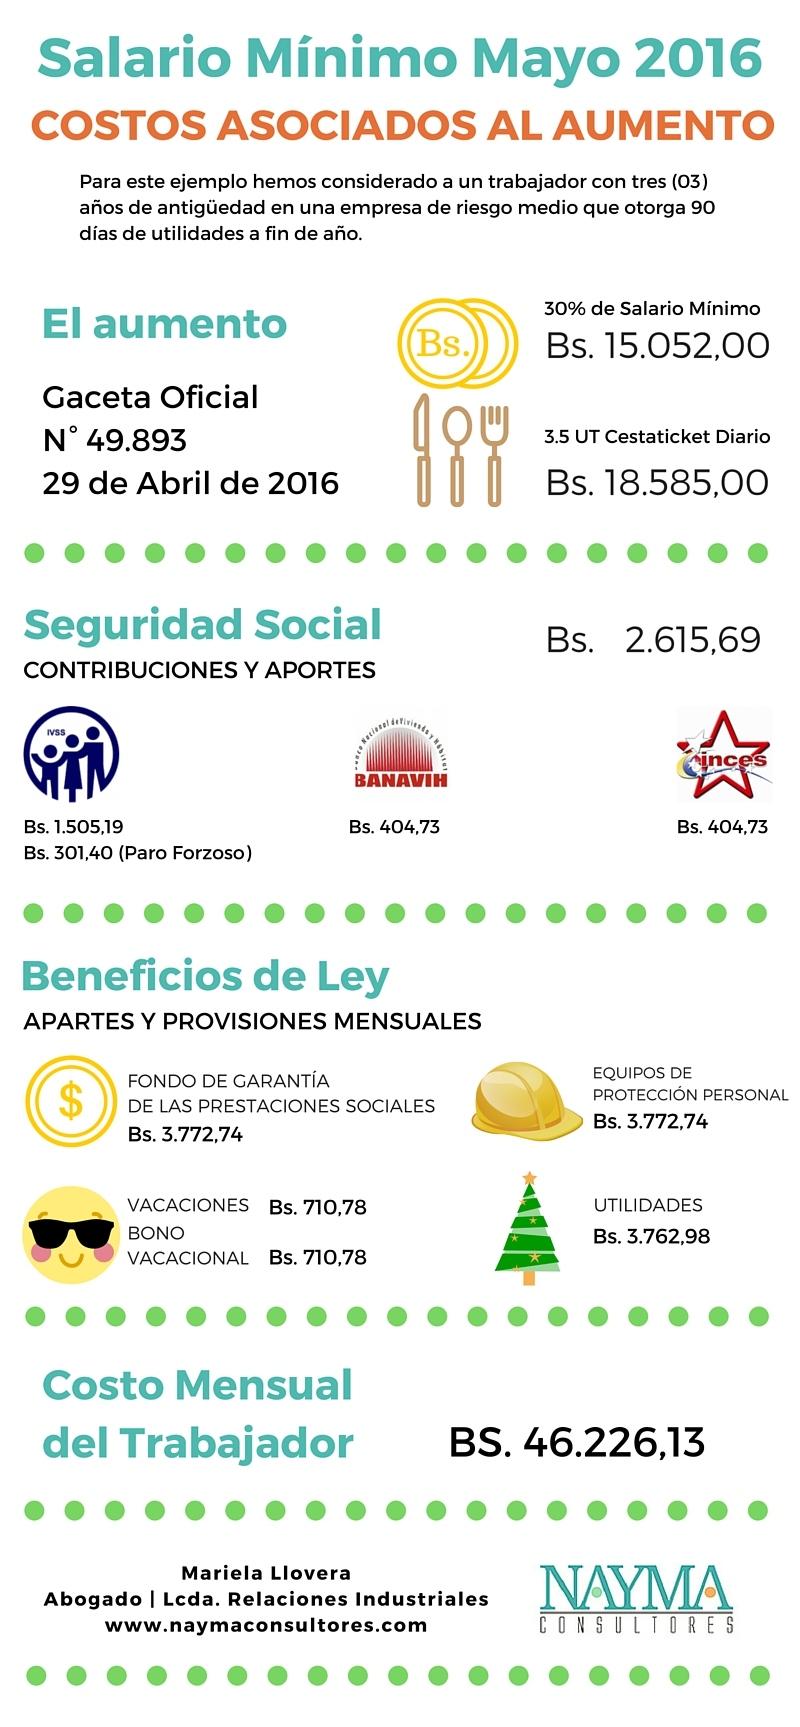 Infografia Costos Aumento Salario Minimo Mayo 2016 Venezuela